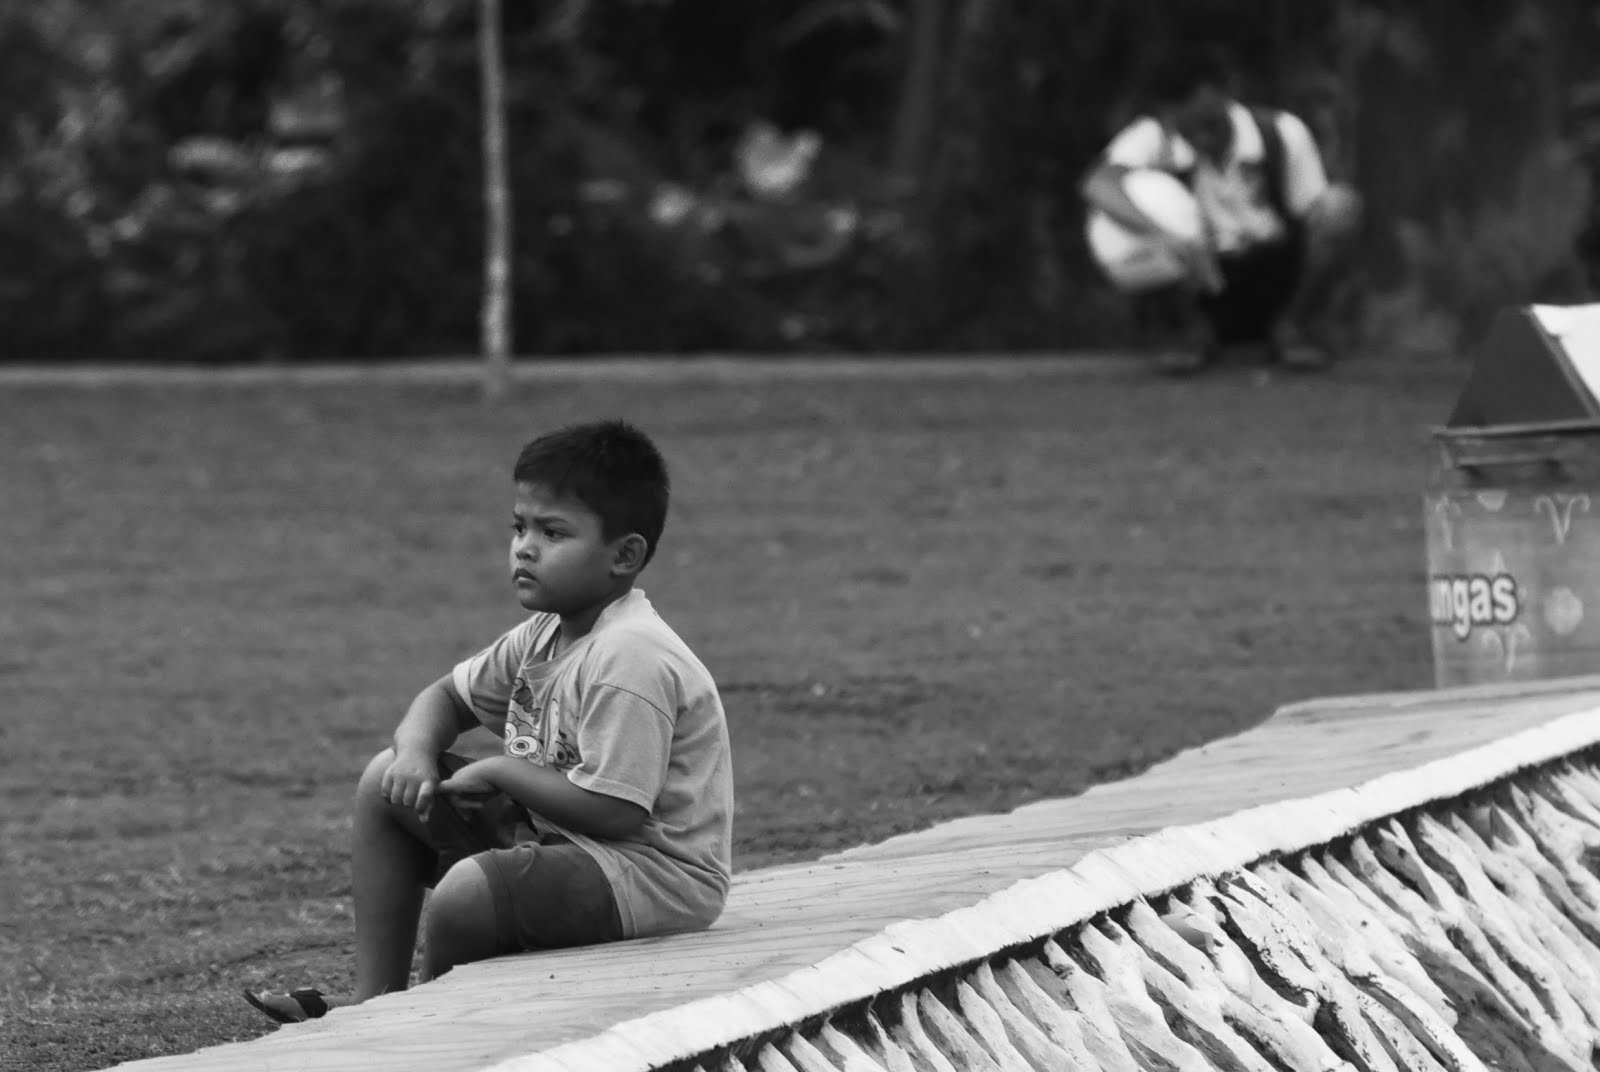 boy's alone, anak sendirian